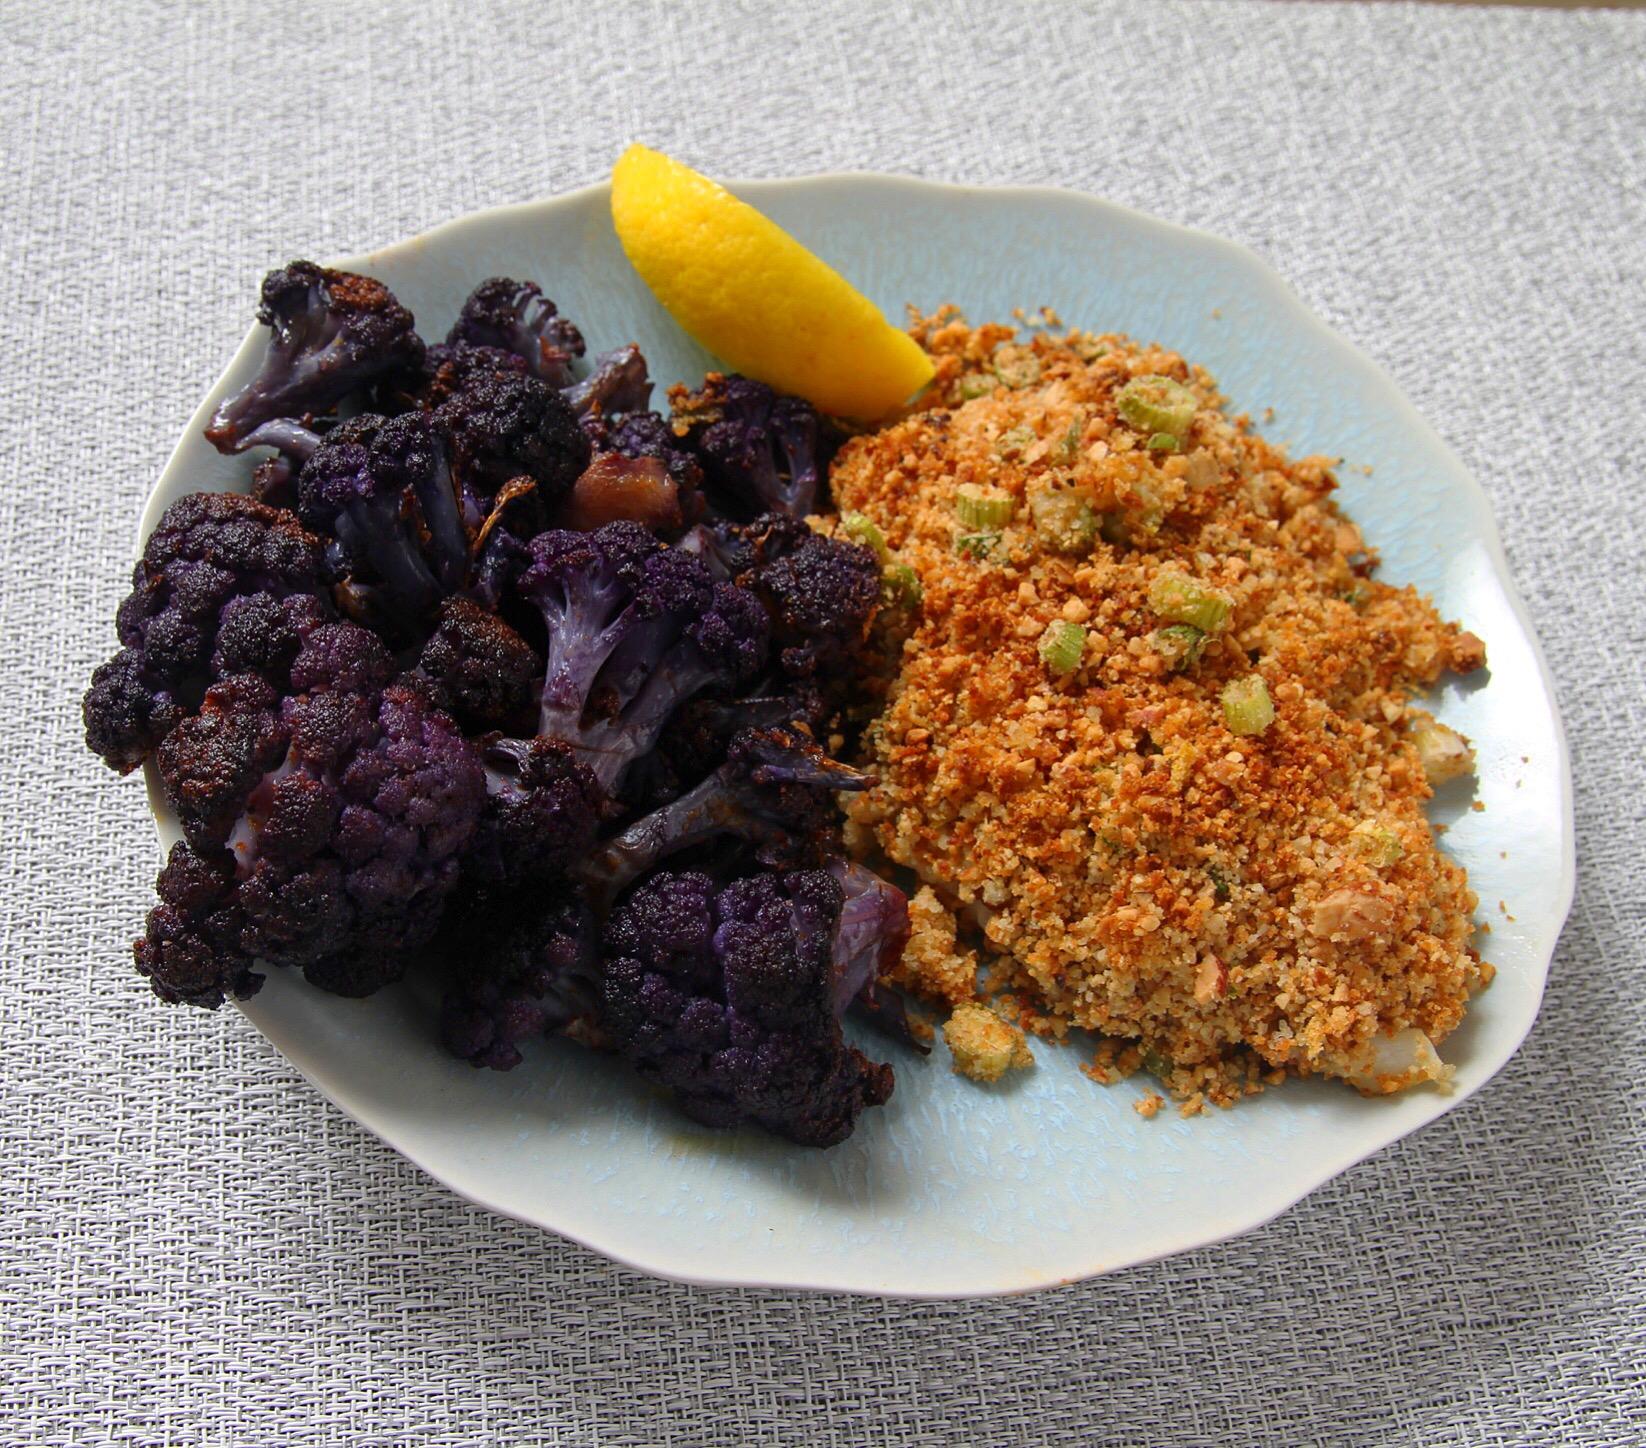 Almond lemon breadcrumb baked cod with roasted purple cauliflower.